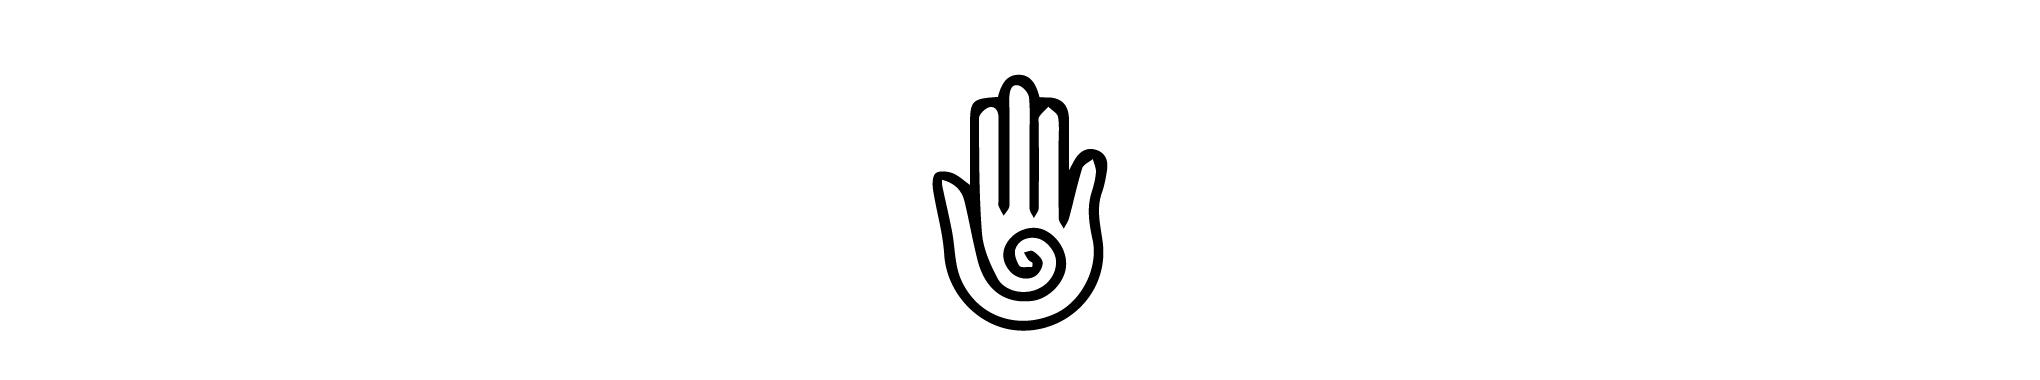 hand crafted logo-01.jpg